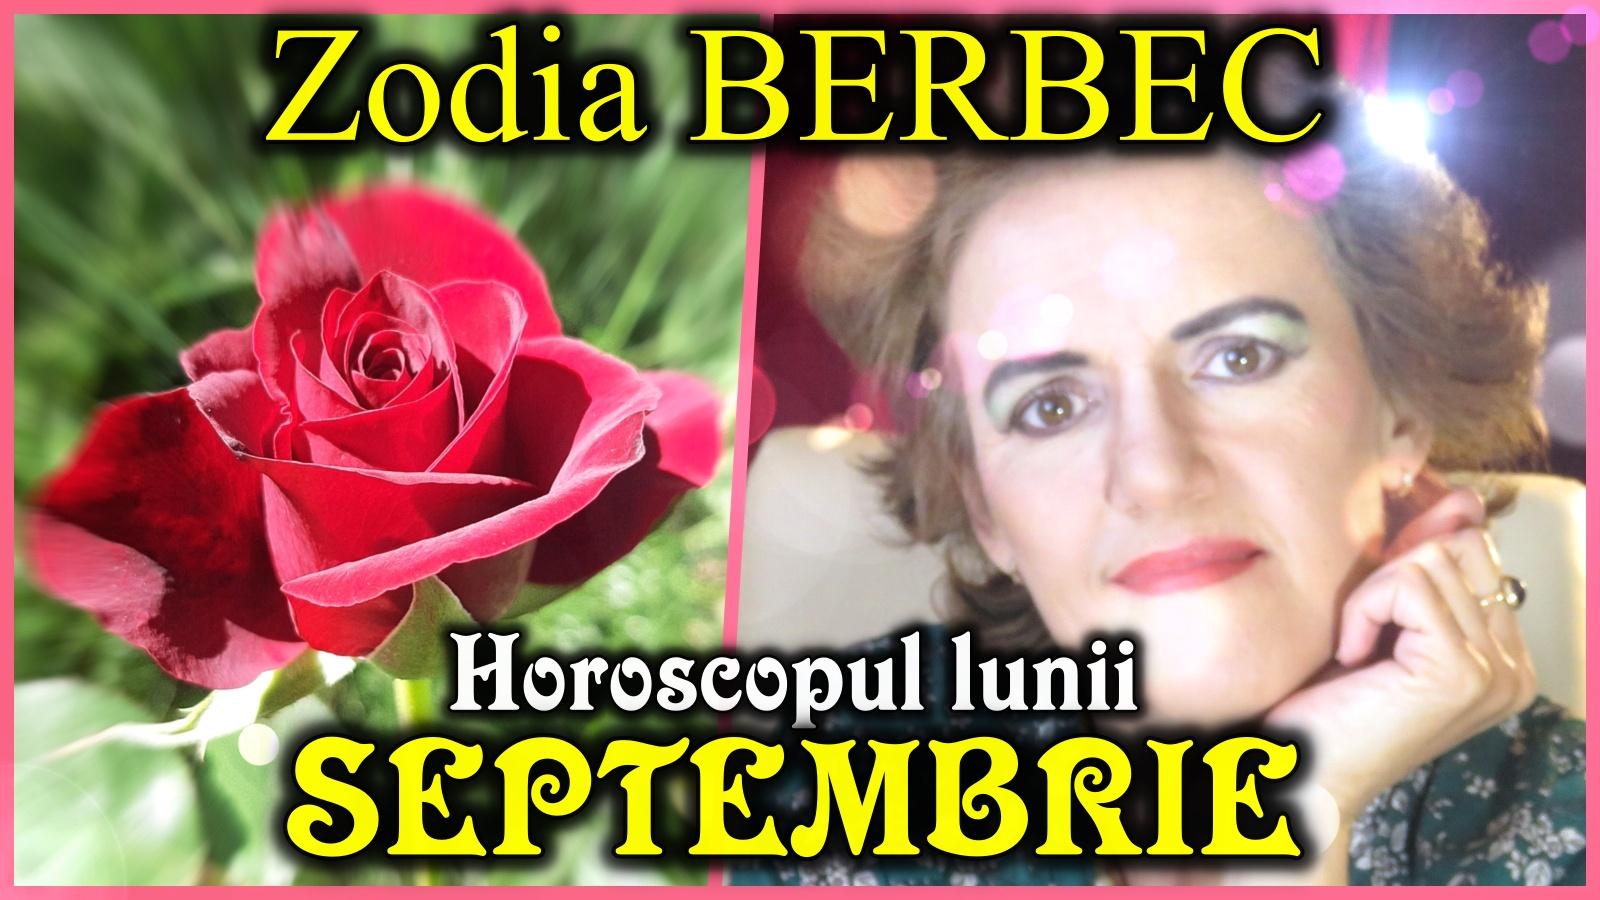 Horoscopul lunii SEPTEMBRIE * Zodia BERBECULUI